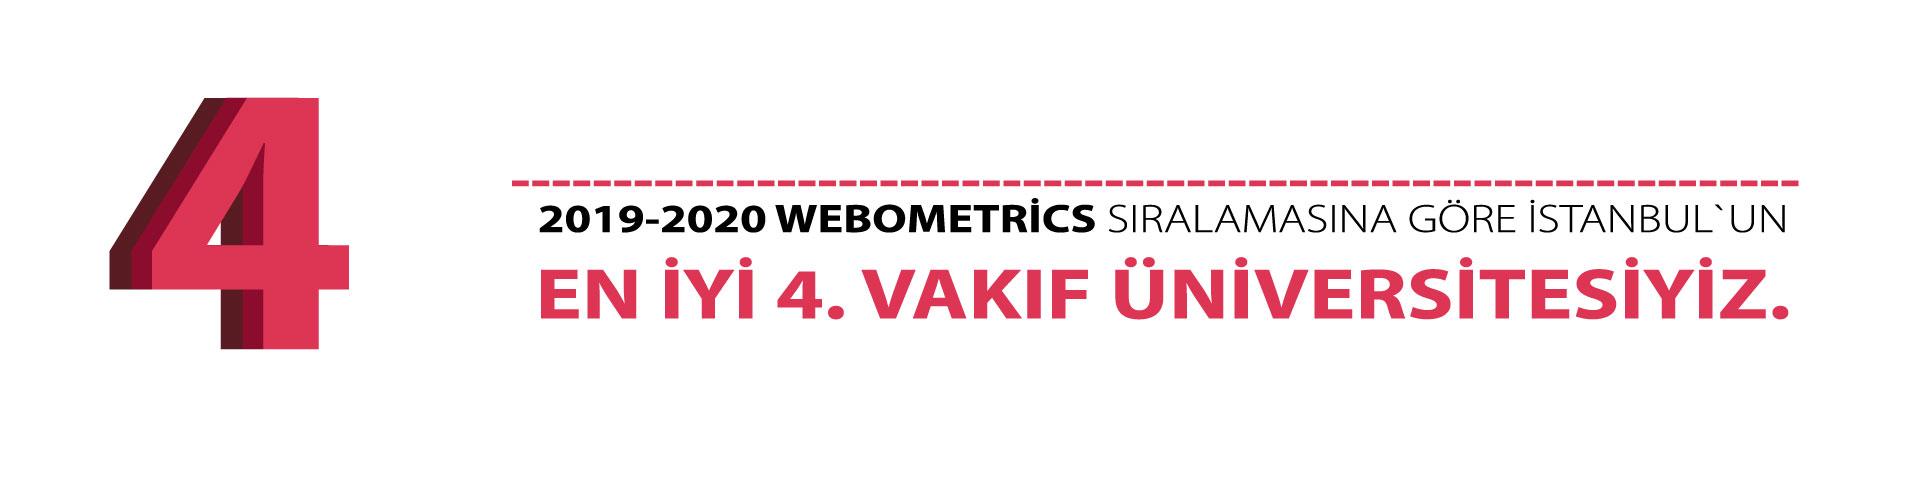 Webometrics-Pc